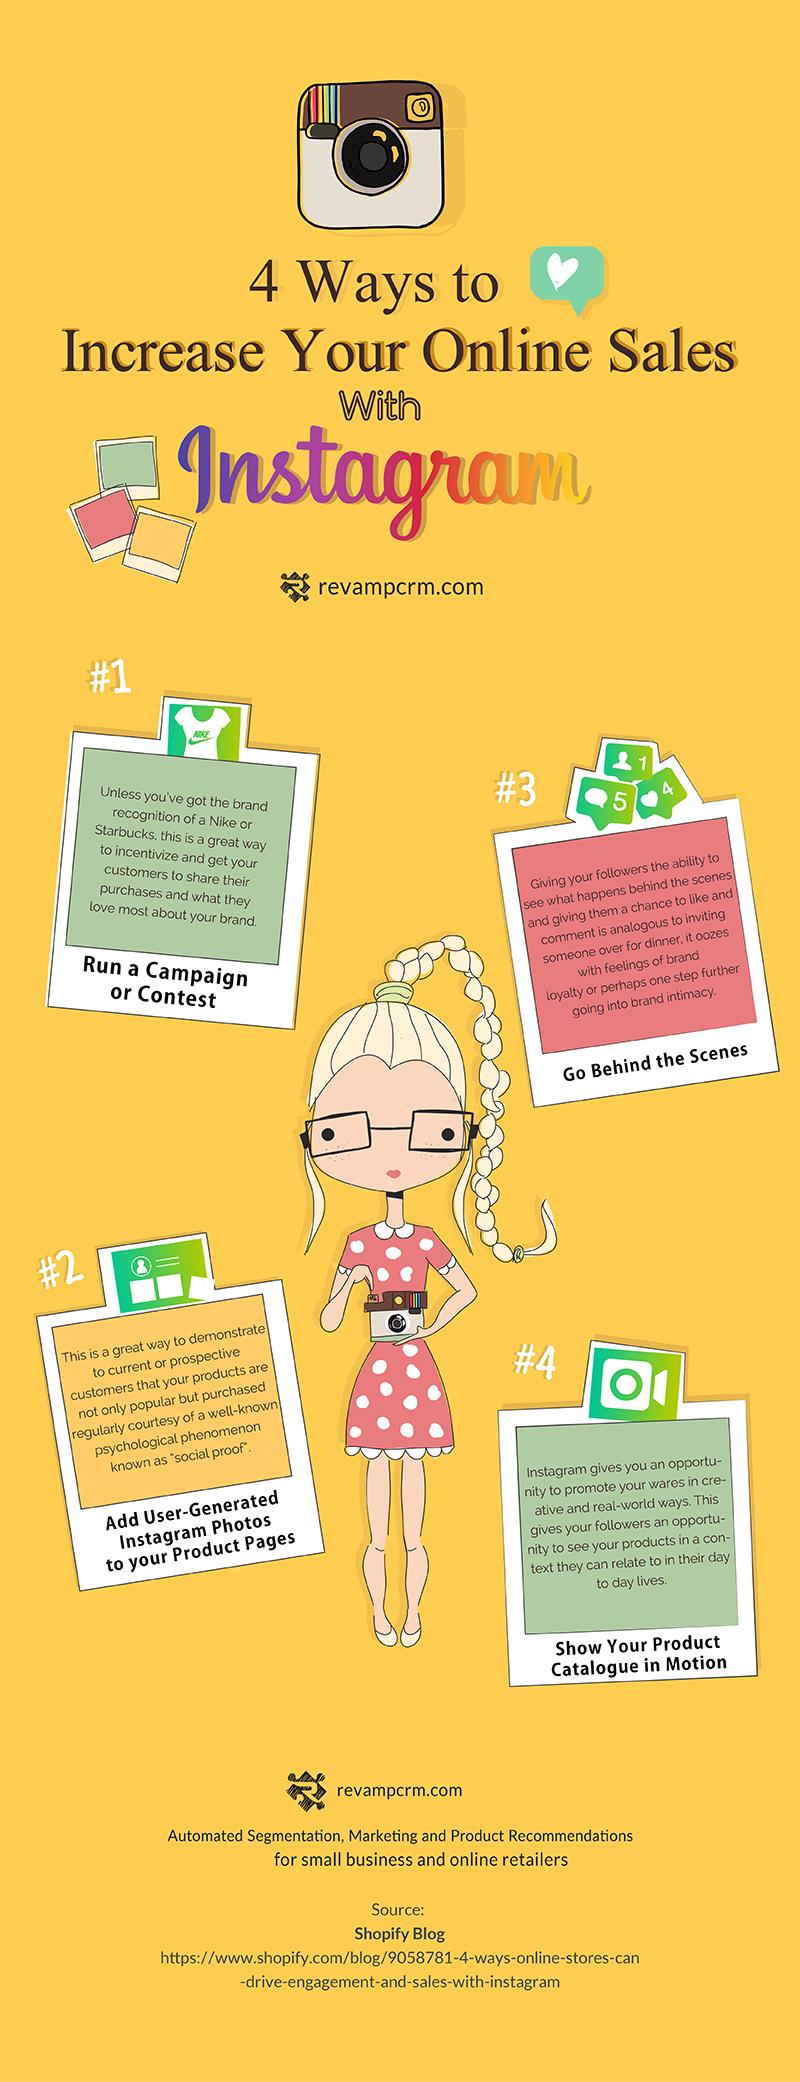 Top 5 Social Media Mistakes